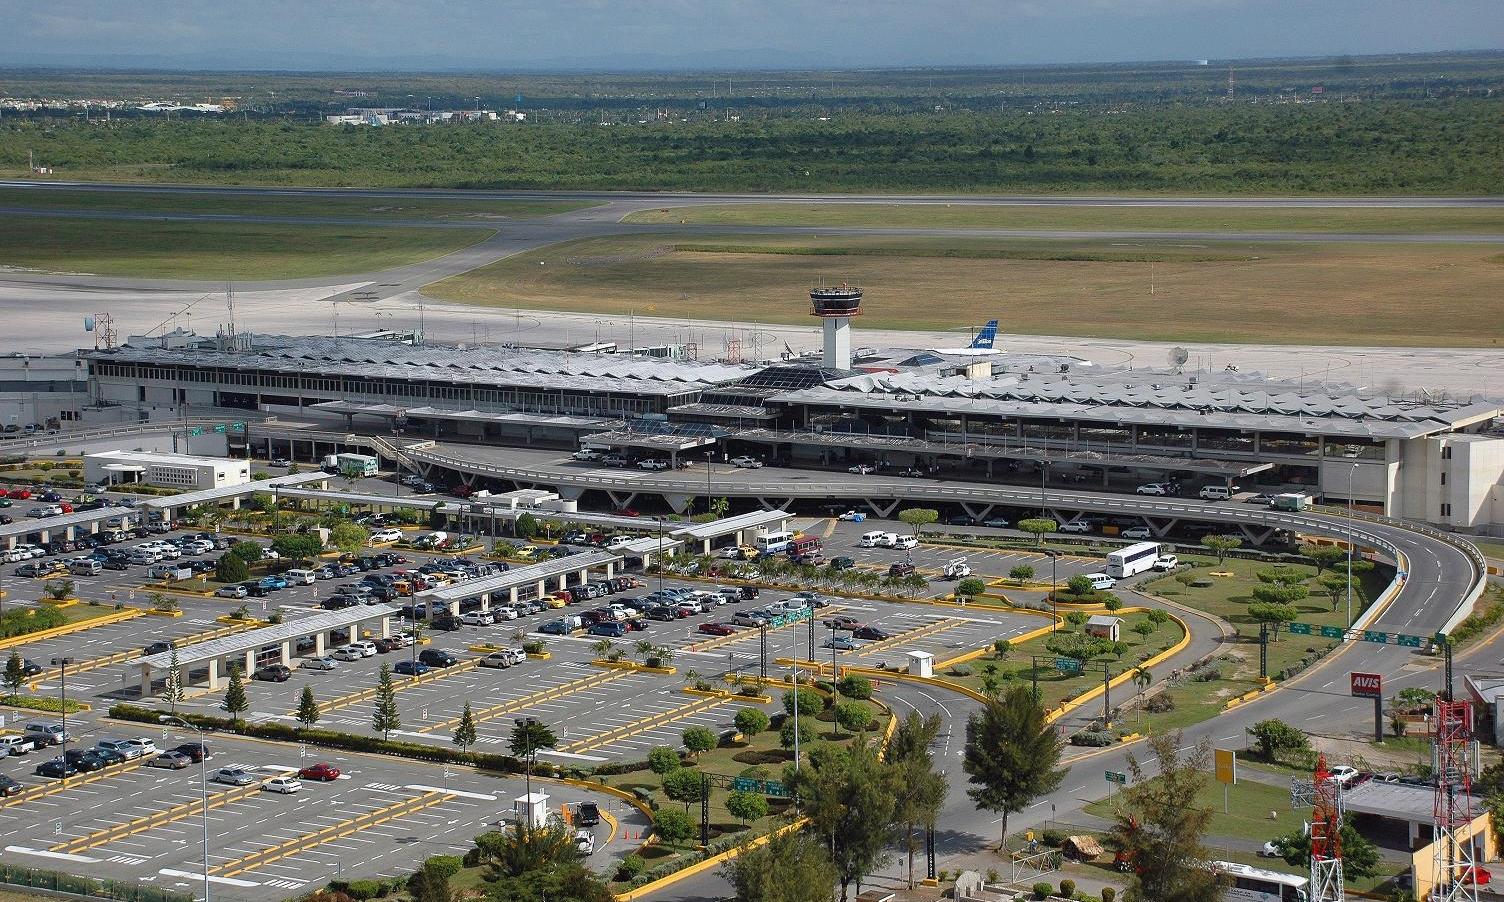 SANTO DOMINGO INTERNATIONAL AIRPORT (SDQ)